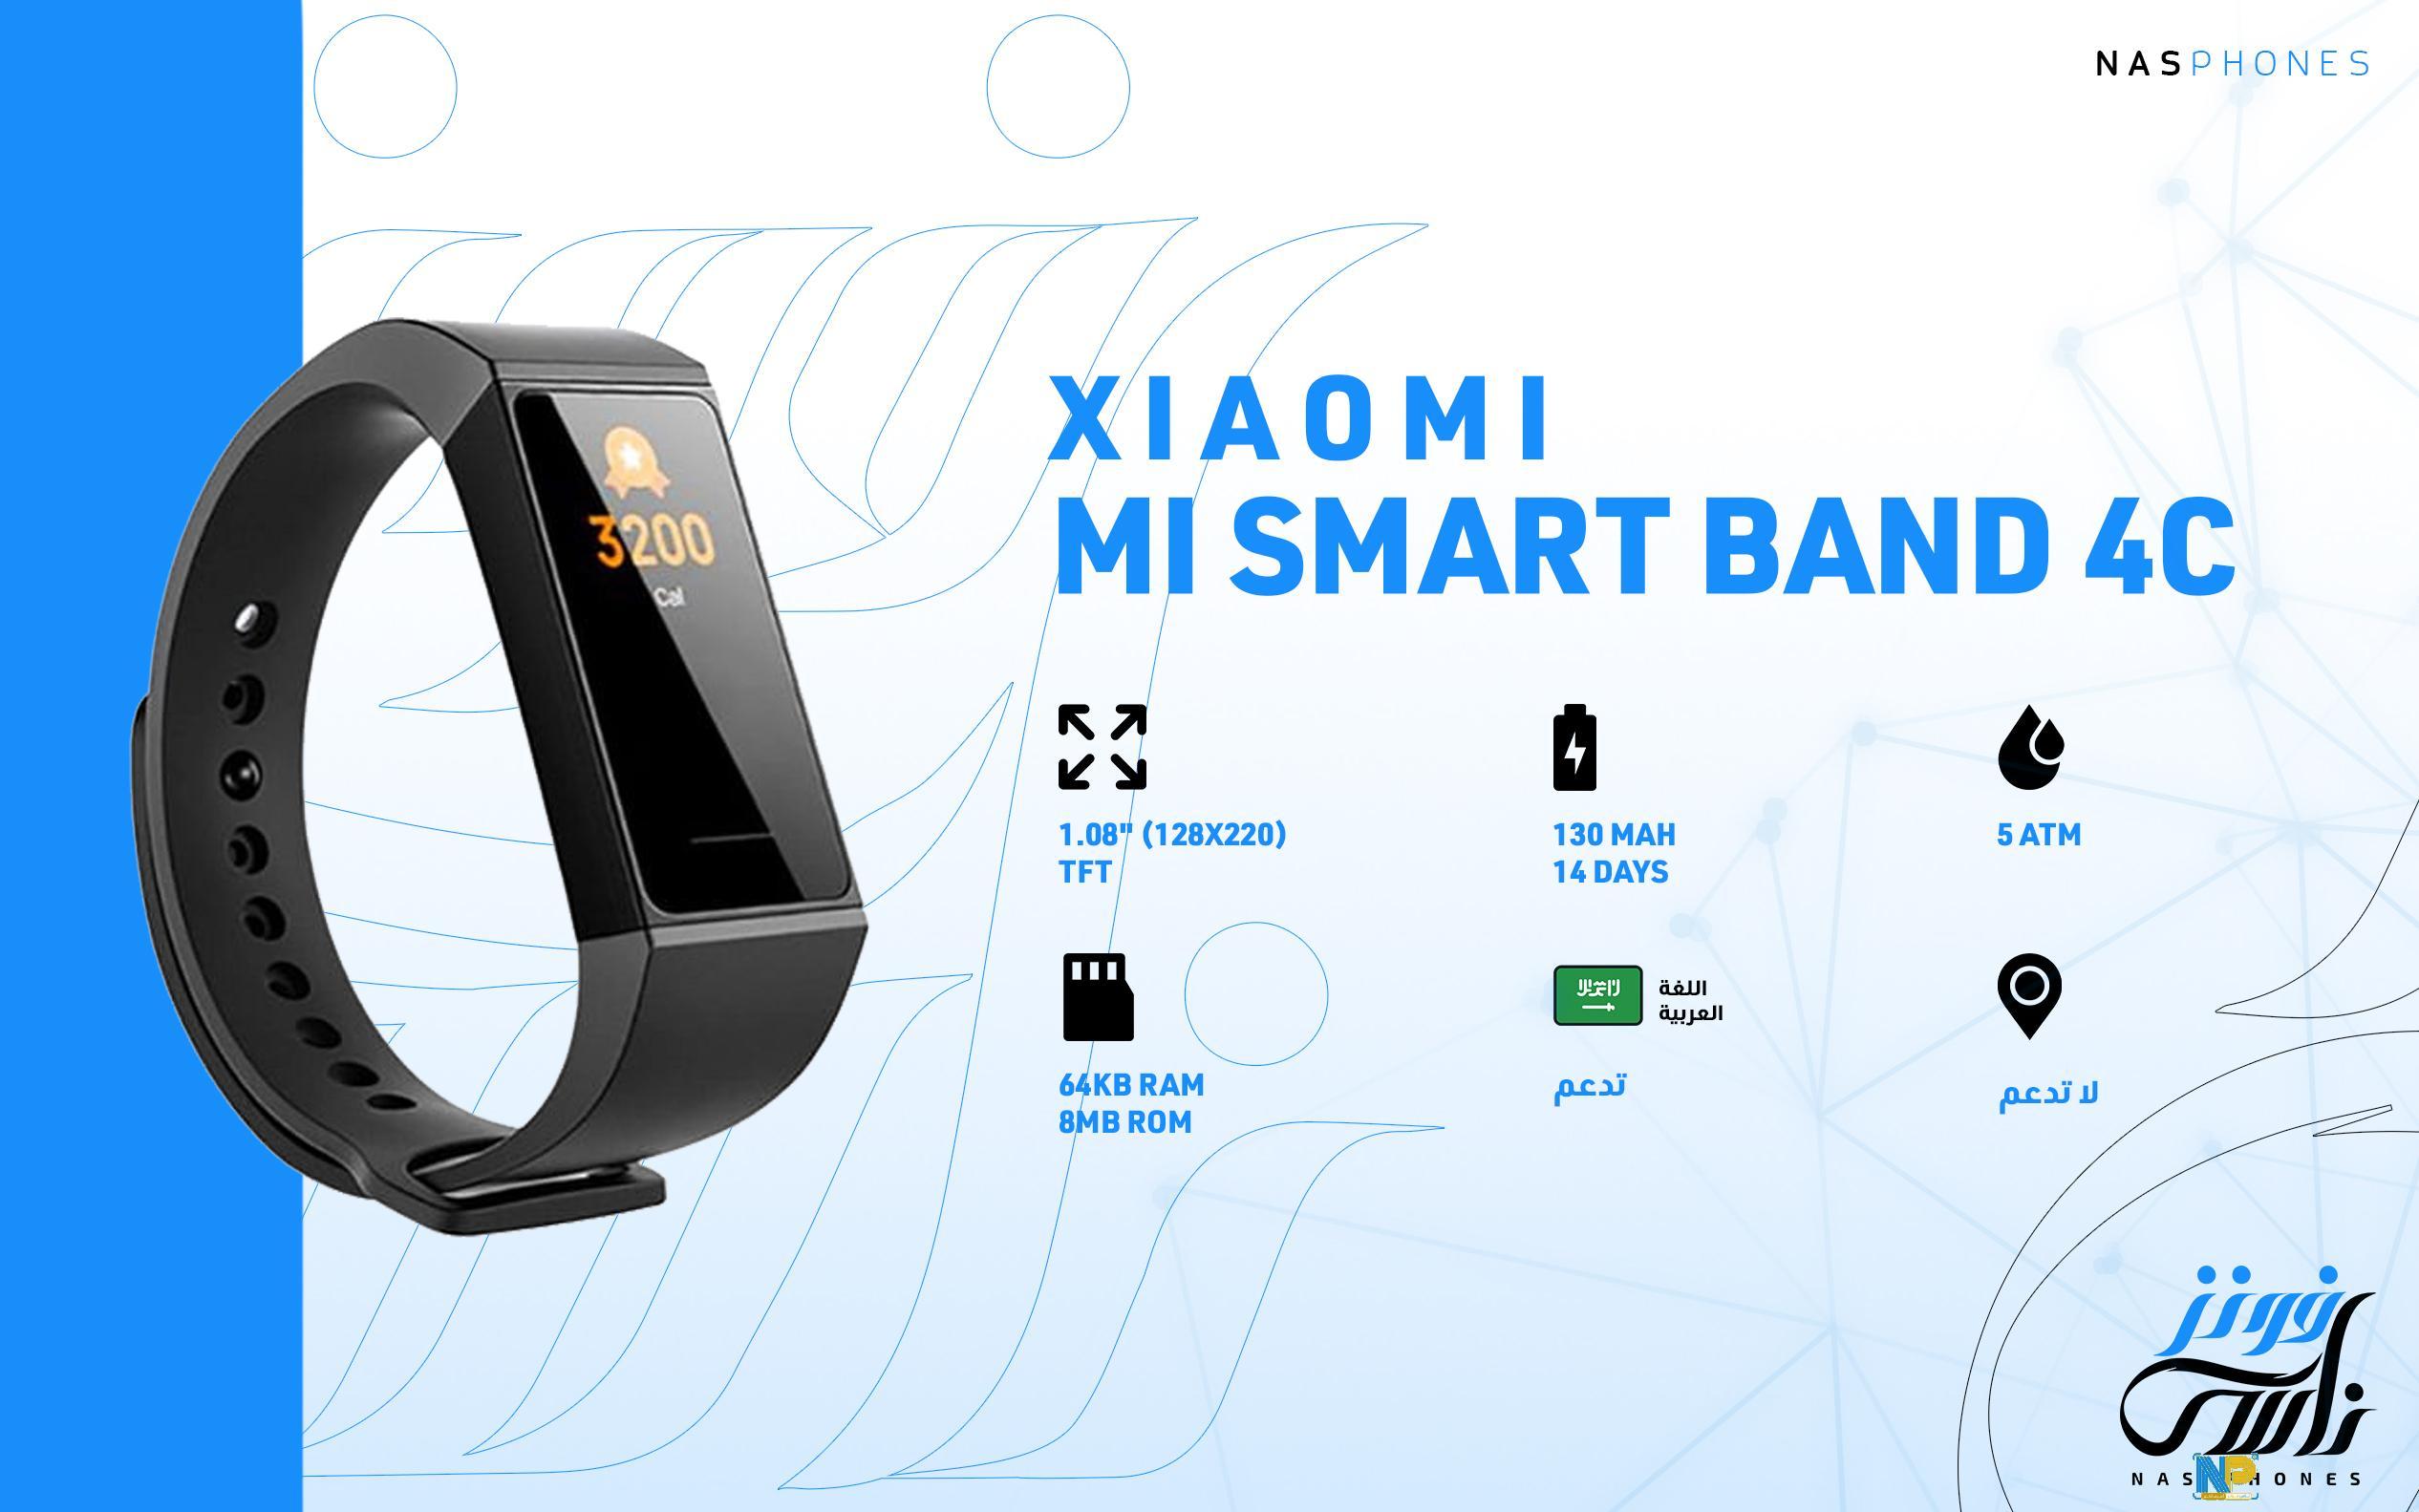 MI Smart Band 4C